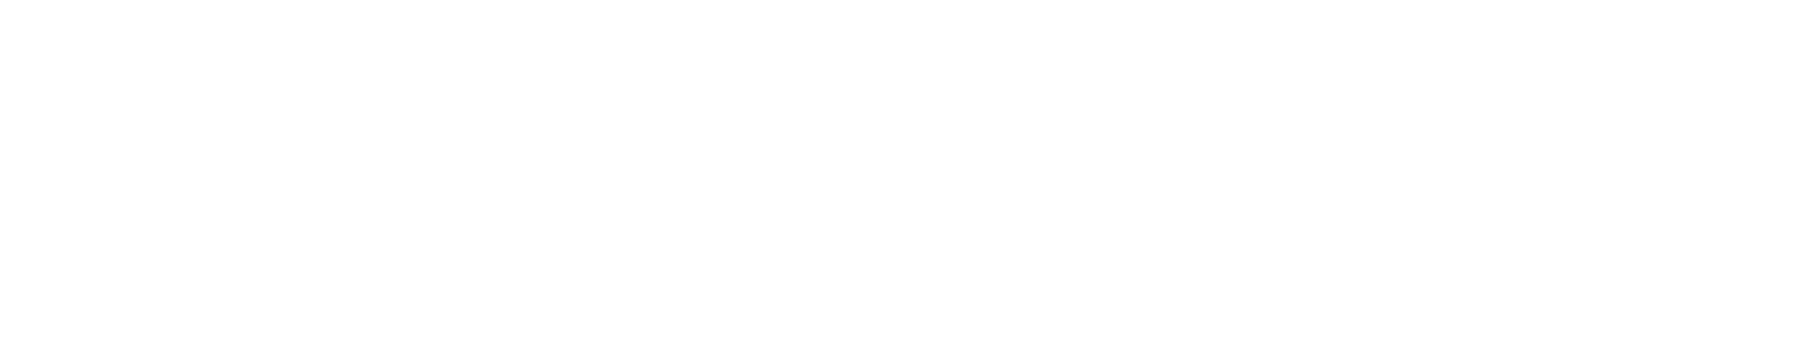 ScanAccount_2001-2021_logo